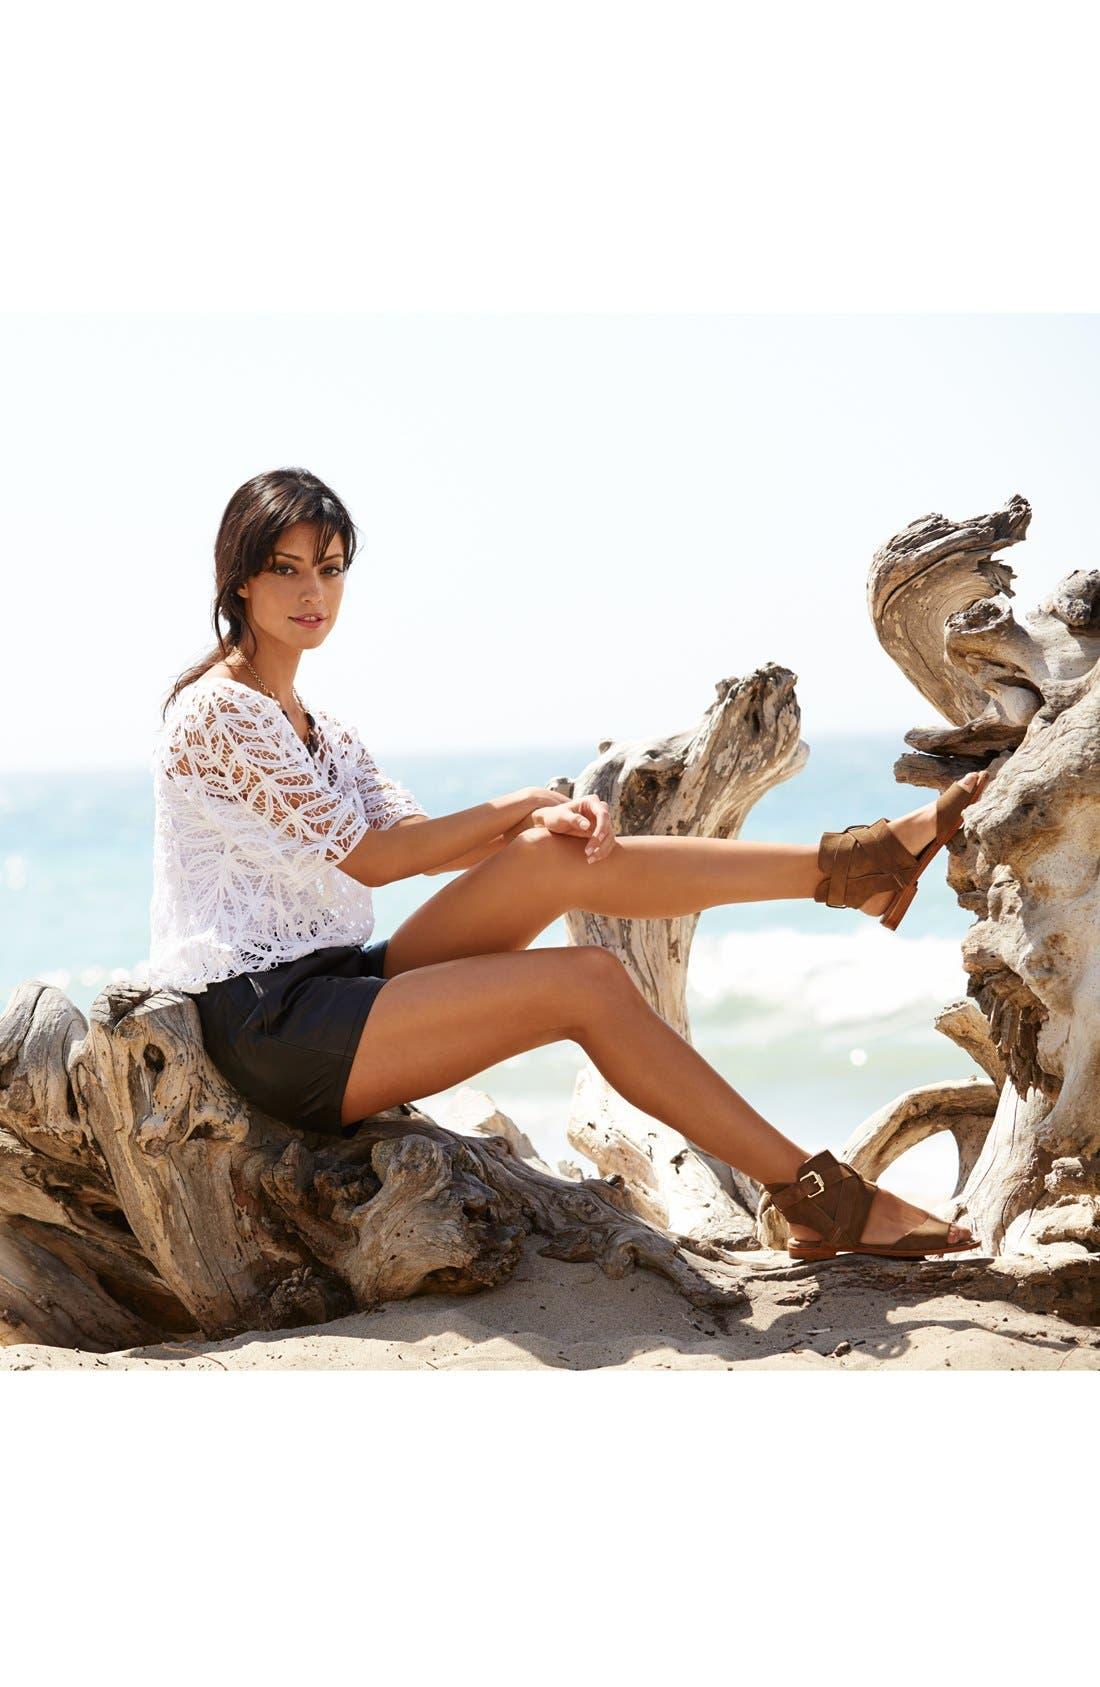 Main Image - VC Signature Sandal, Hinge® Crochet Top & Halogen® Leather Shorts